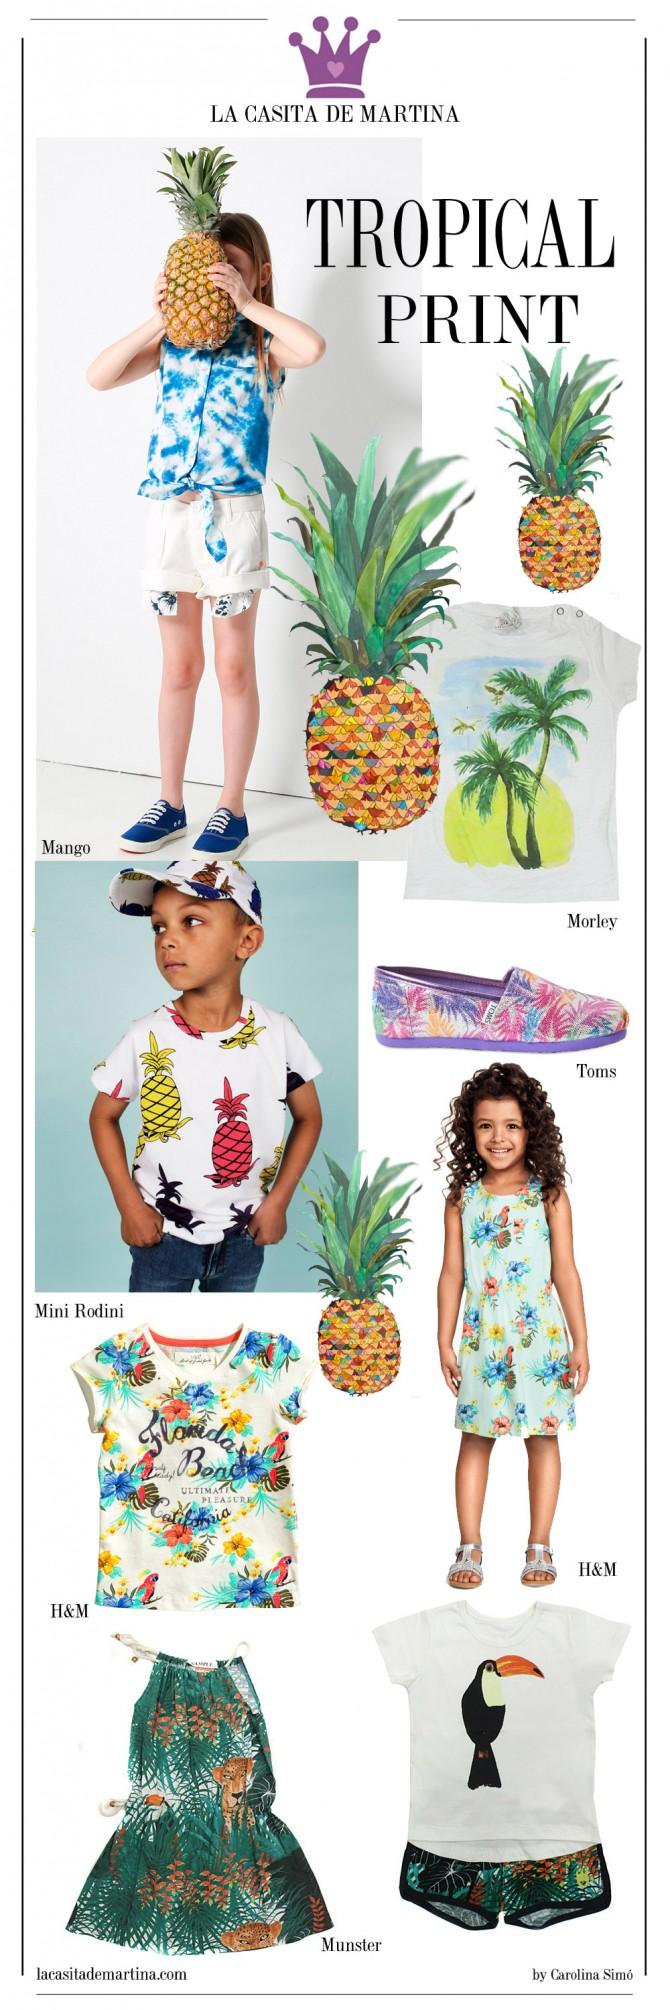 Mango kids, Tendencias Moda Infantil, Blog Moda Infantil, Ropa Niños, La casita de Martina